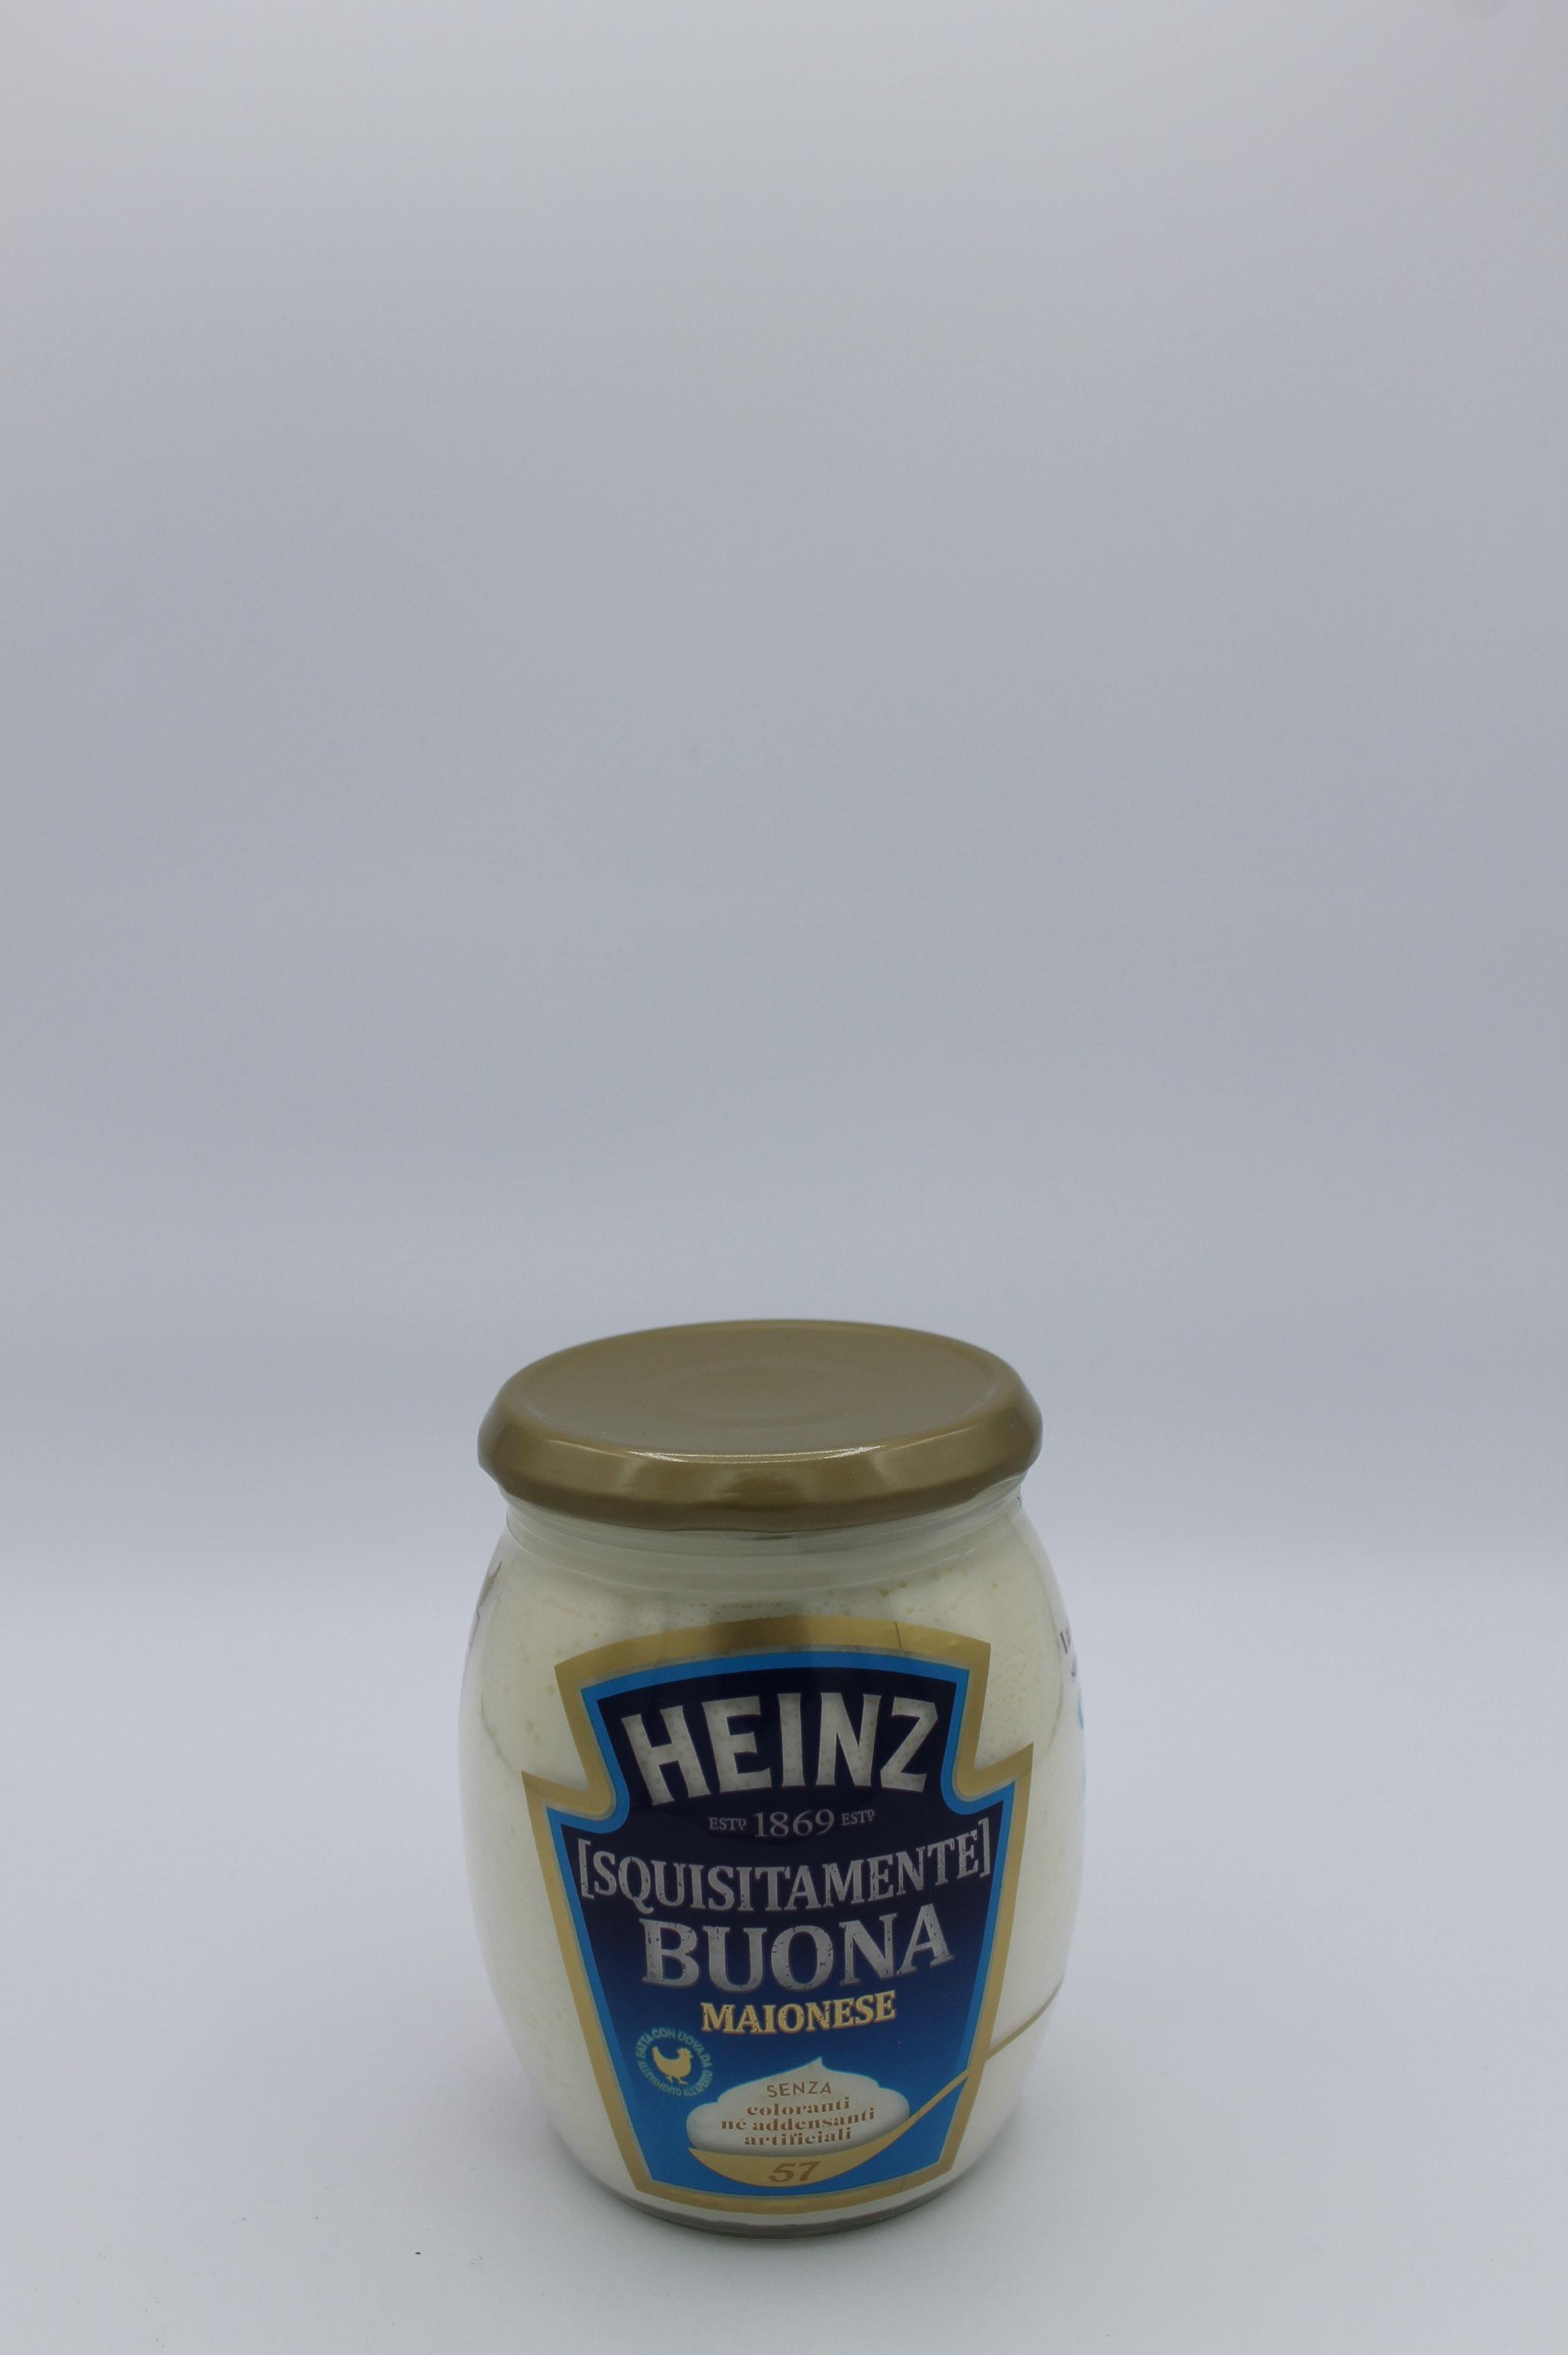 Heinz maionese vetro 460 gr.